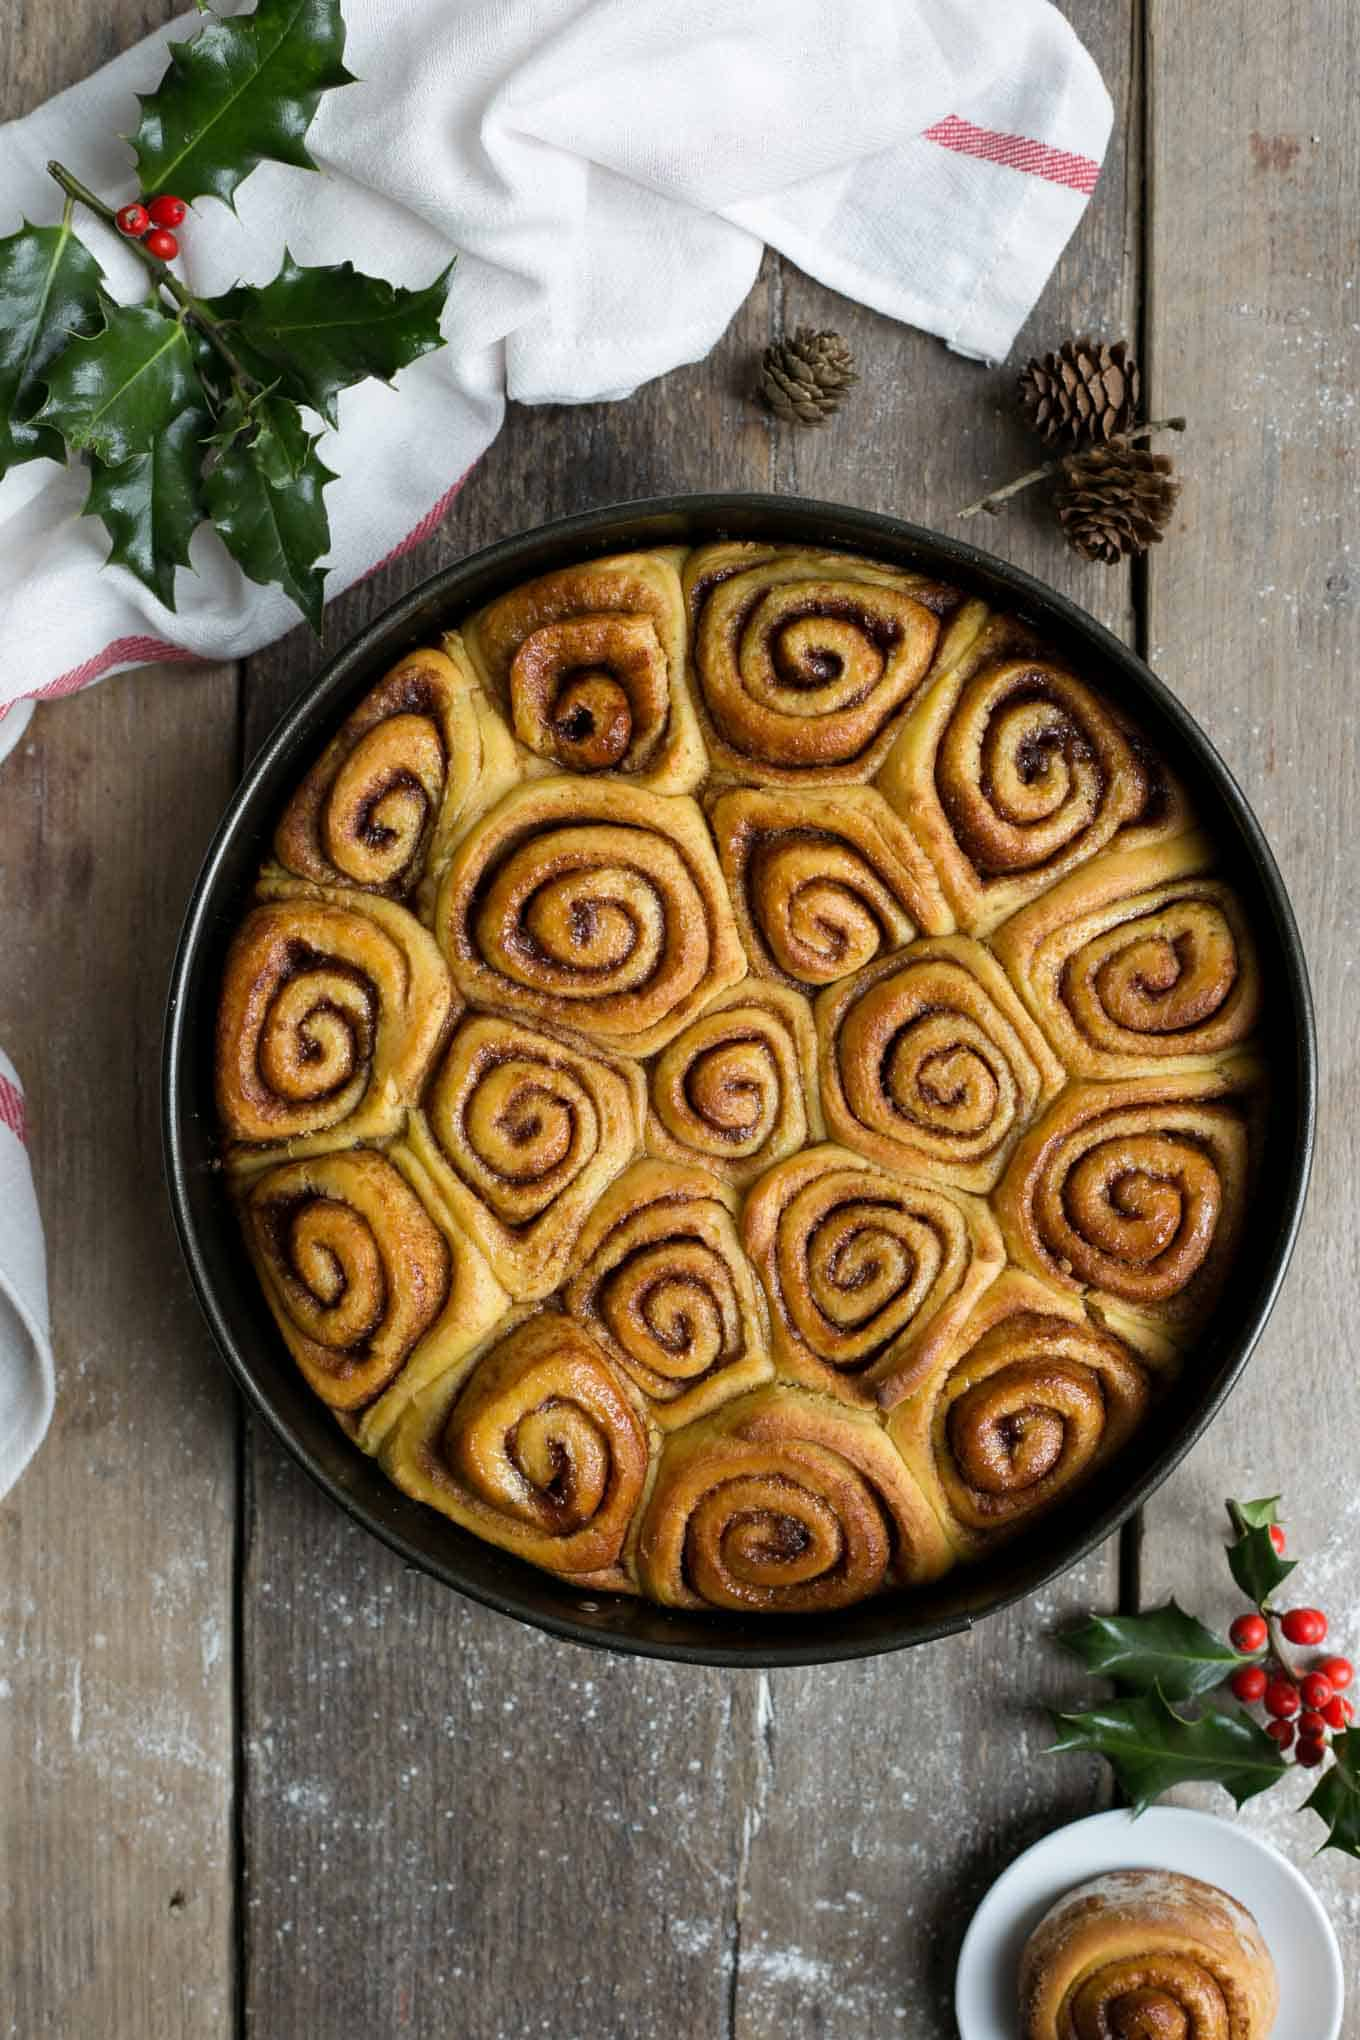 Vegan sweet potato cinnamon rolls, delicious #breakfast or #brunch! #vegan #cinnamonrolls | via @annabanana.co